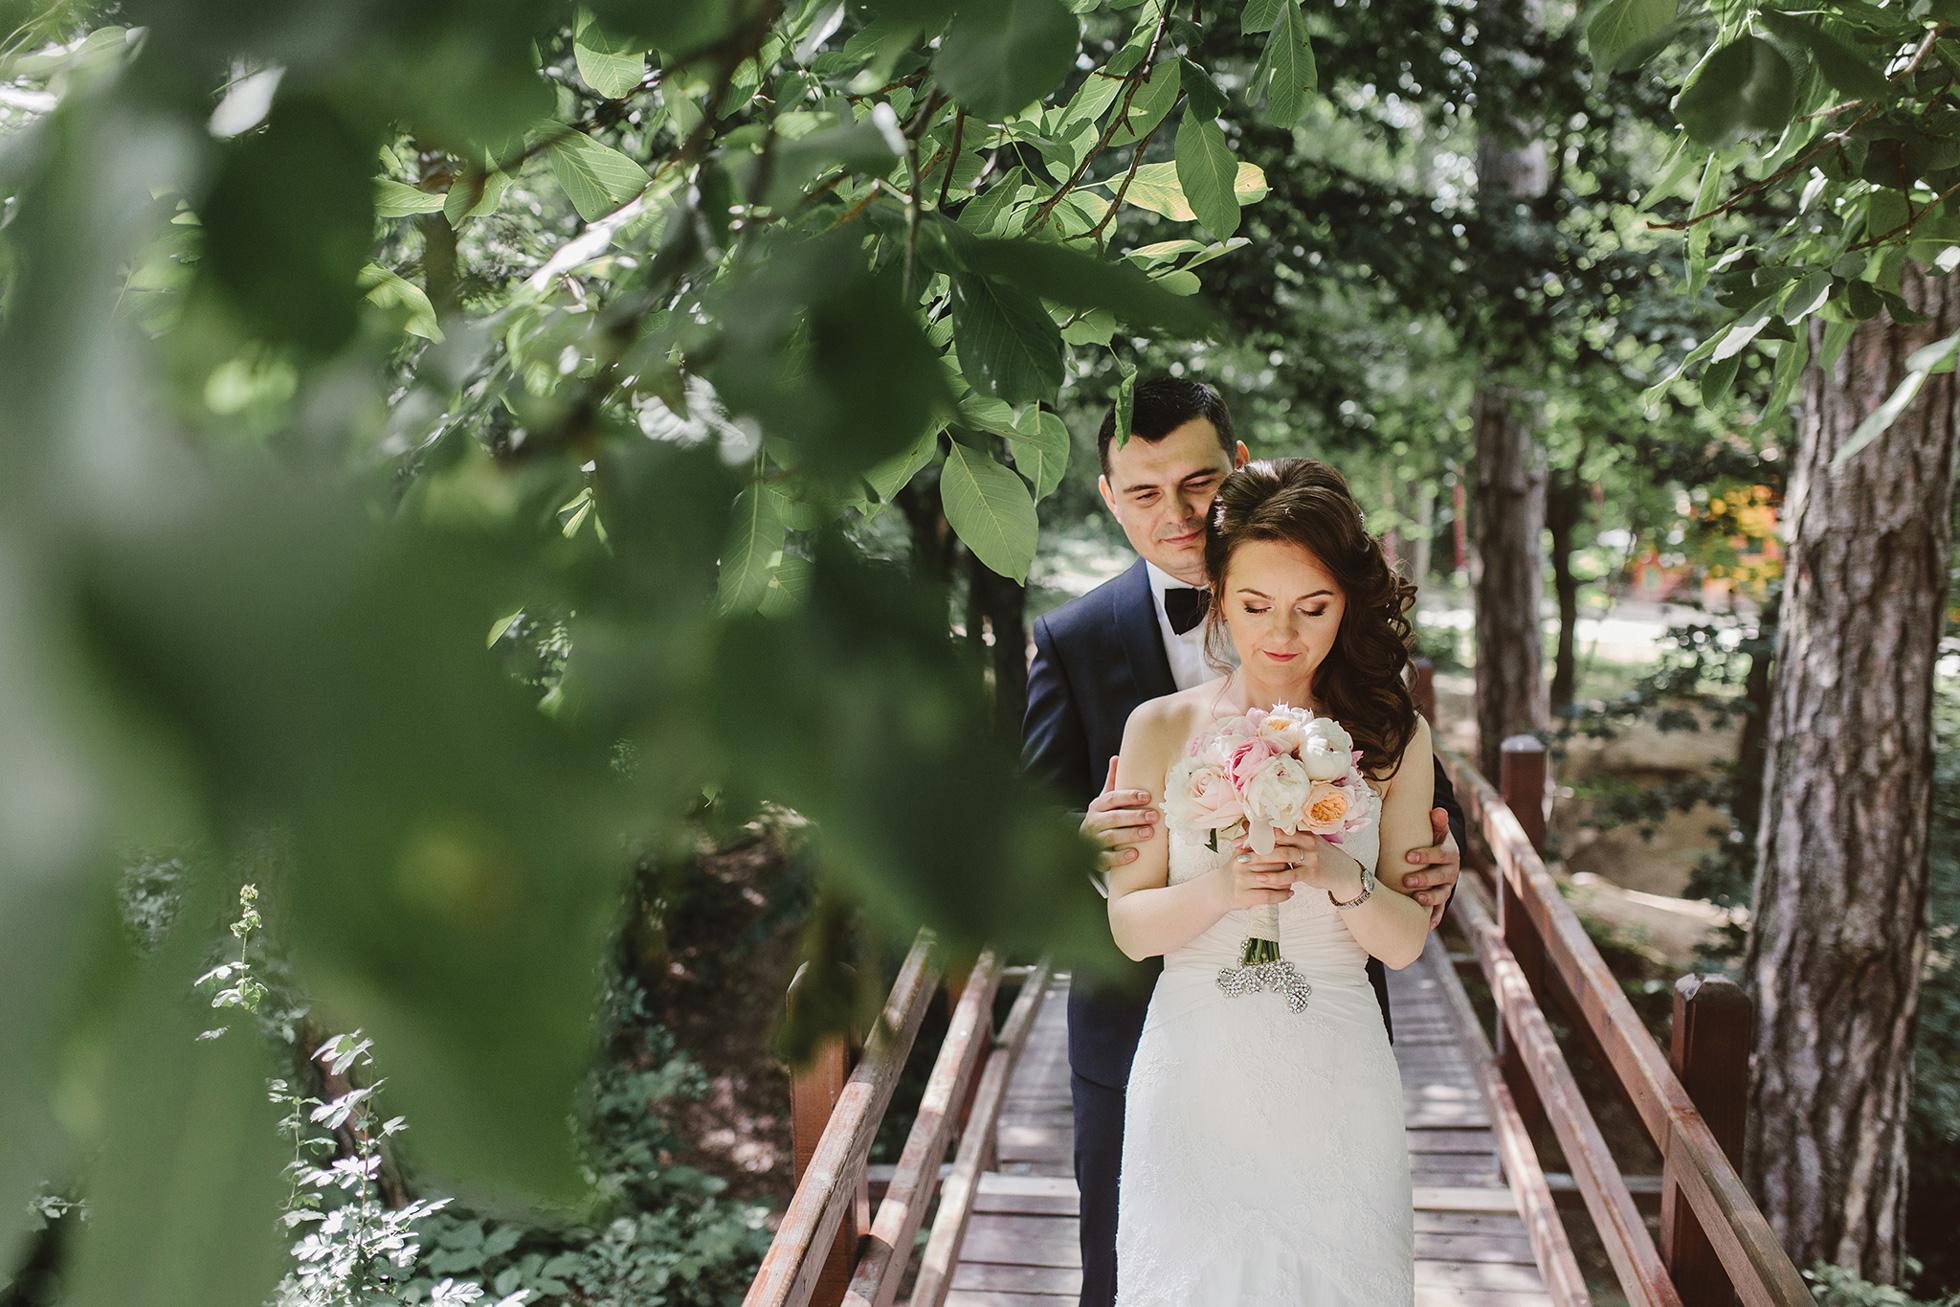 Liana-+-Florin-{wedding}-049